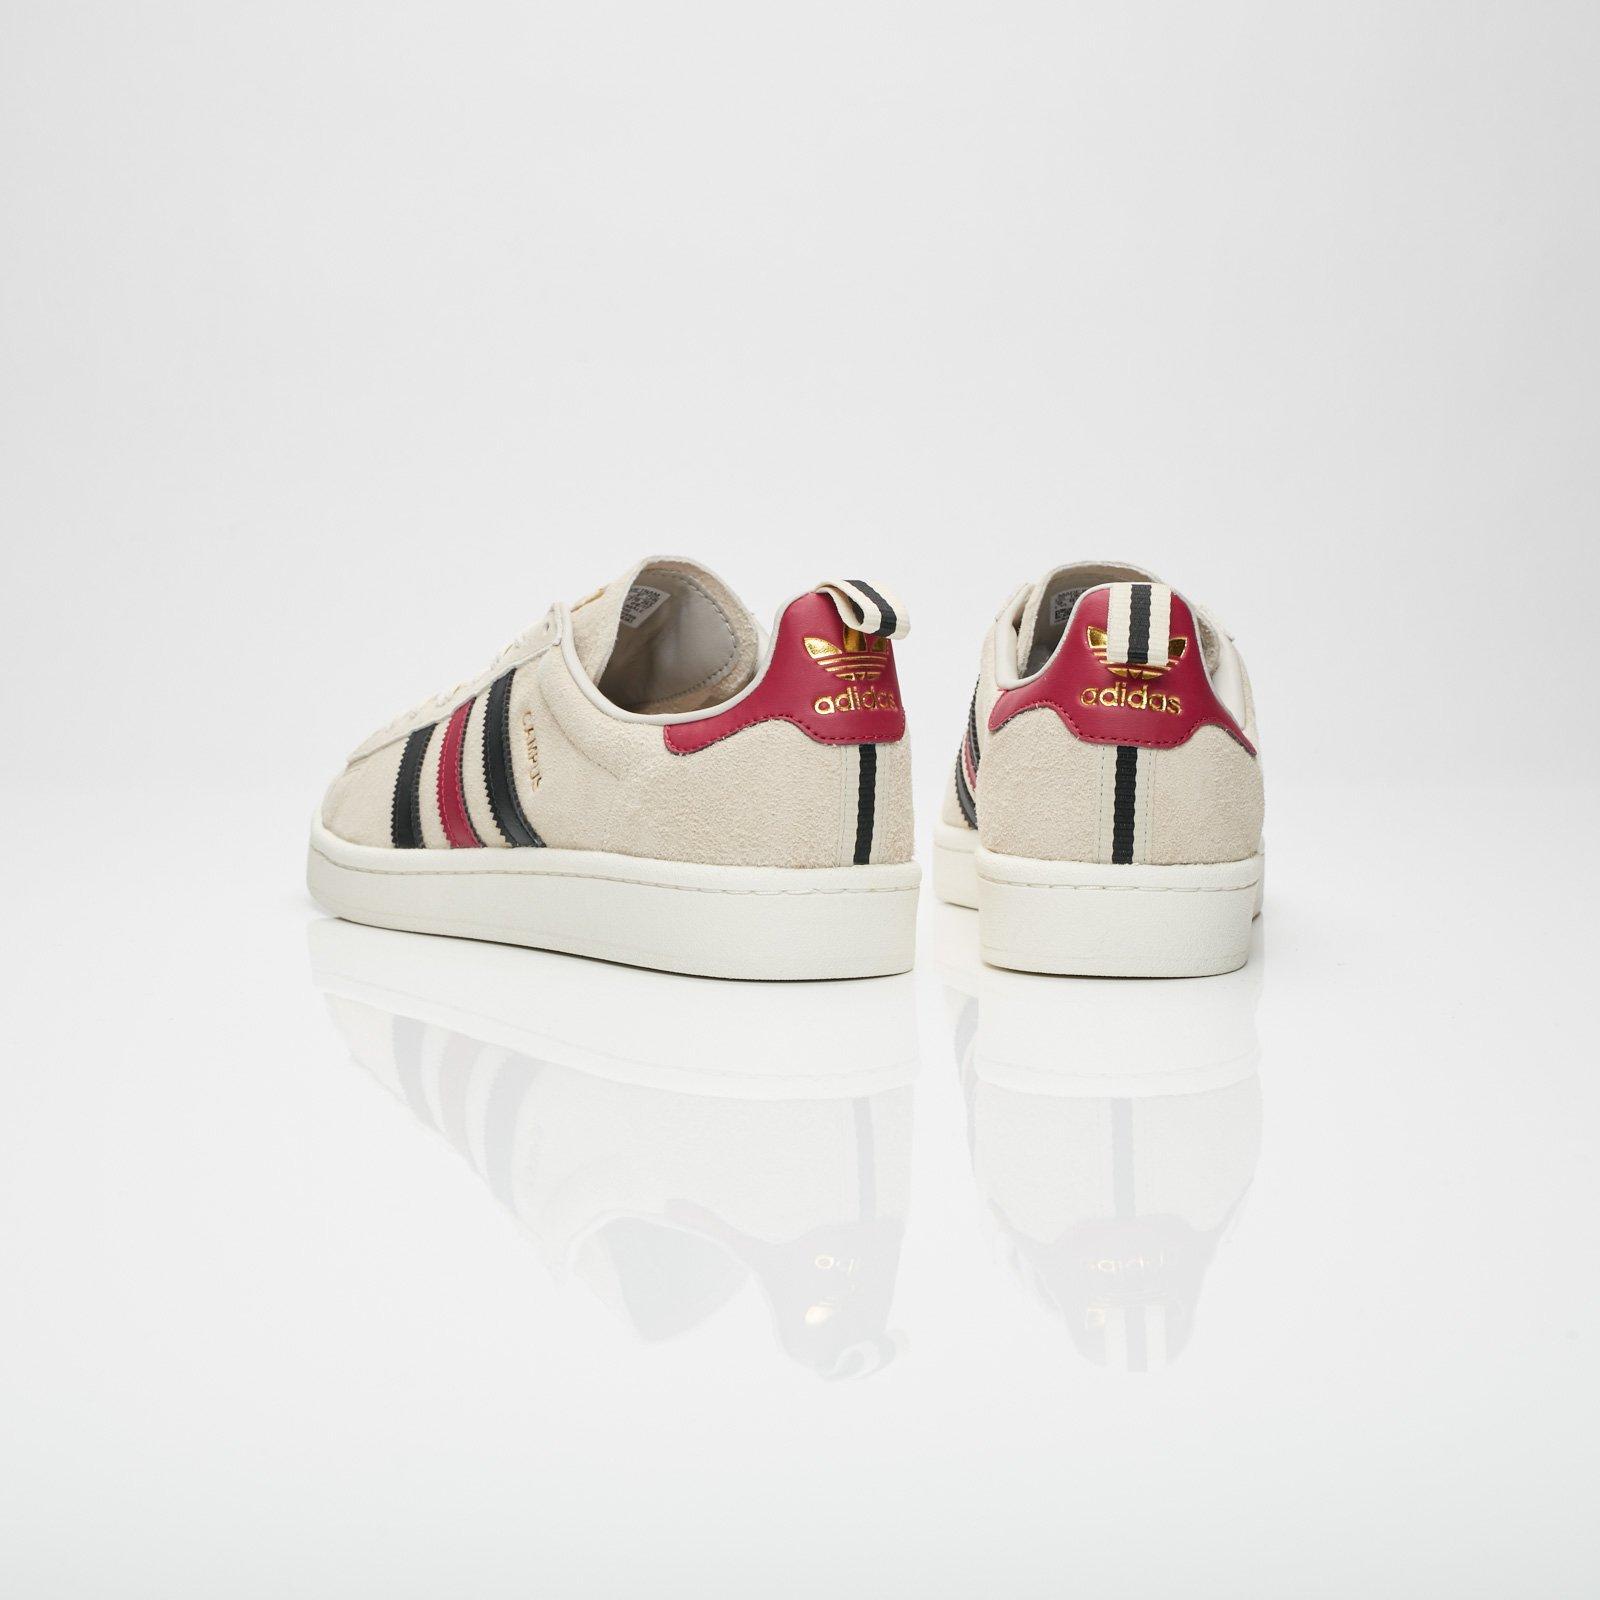 adidas Campus - Cq2048 - Sneakersnstuff